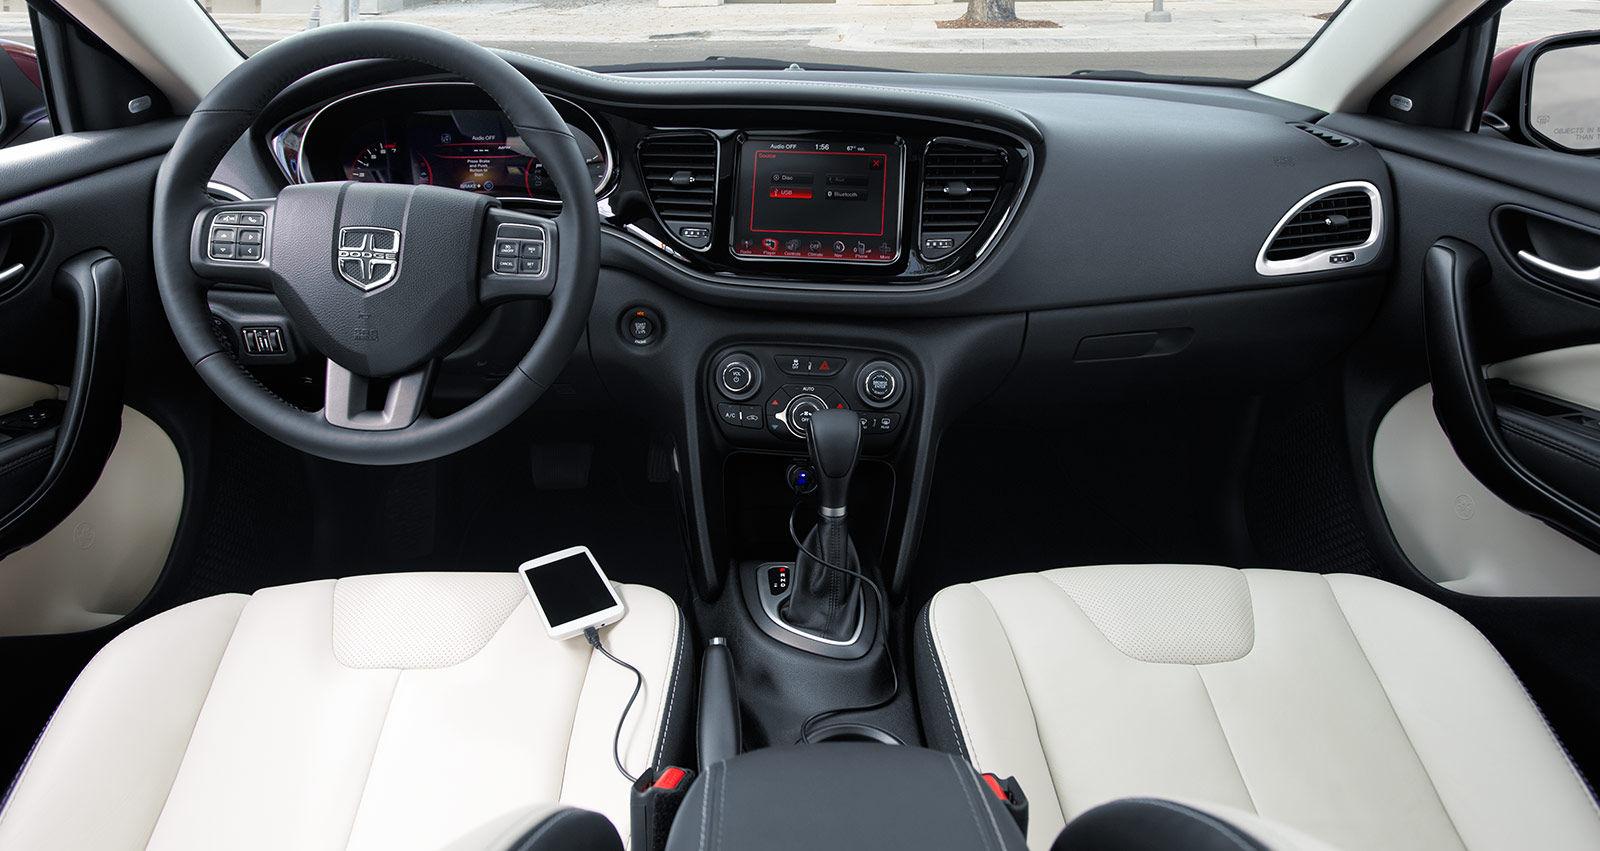 2016 Dodge Dart: Interior